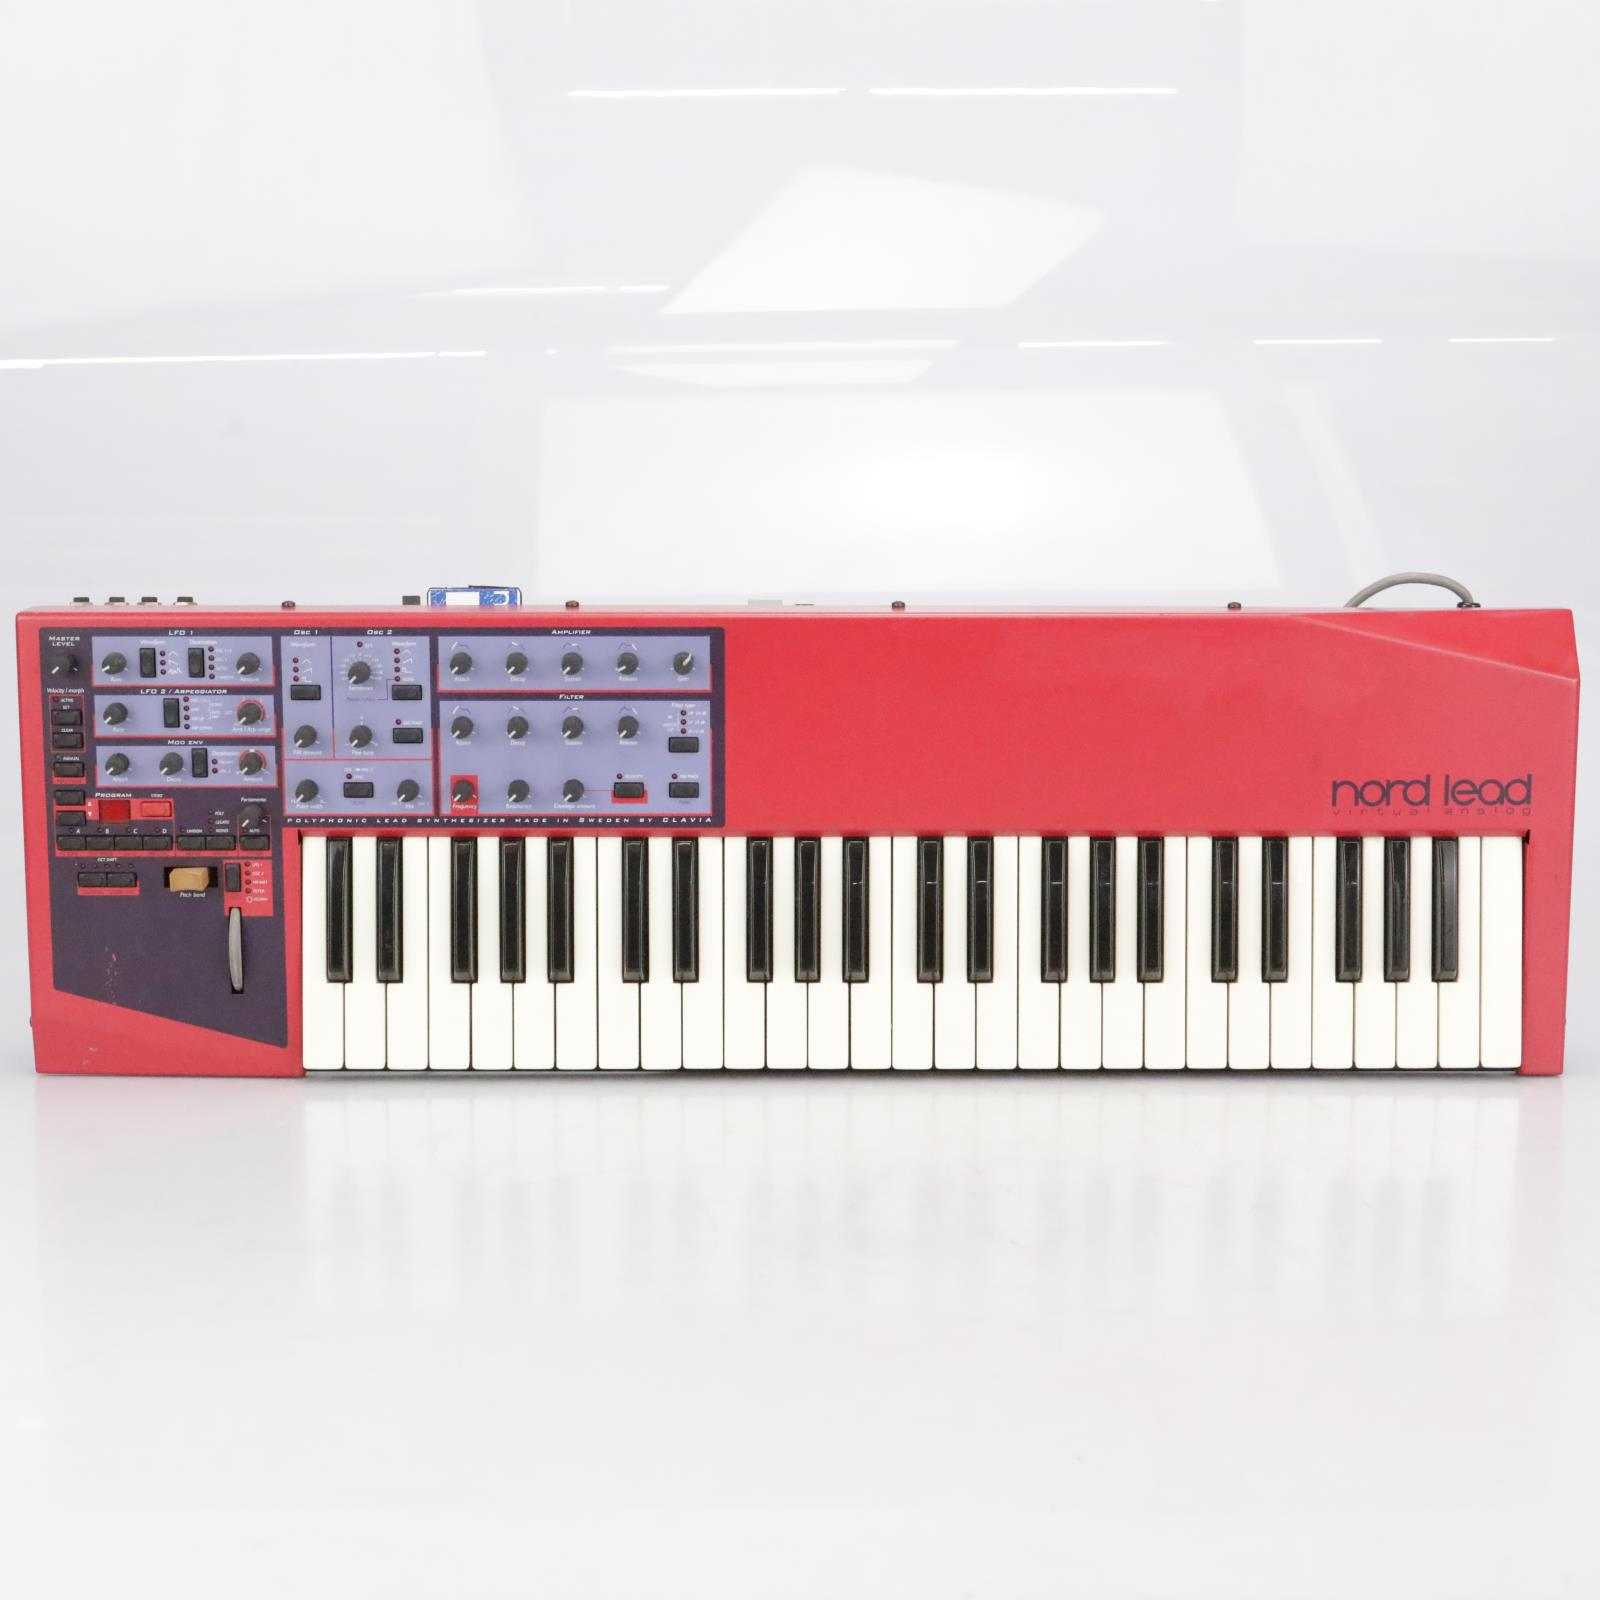 Clavia Nord Lead Virtual Analog Synthesizer w/ Sound Card Original #41997